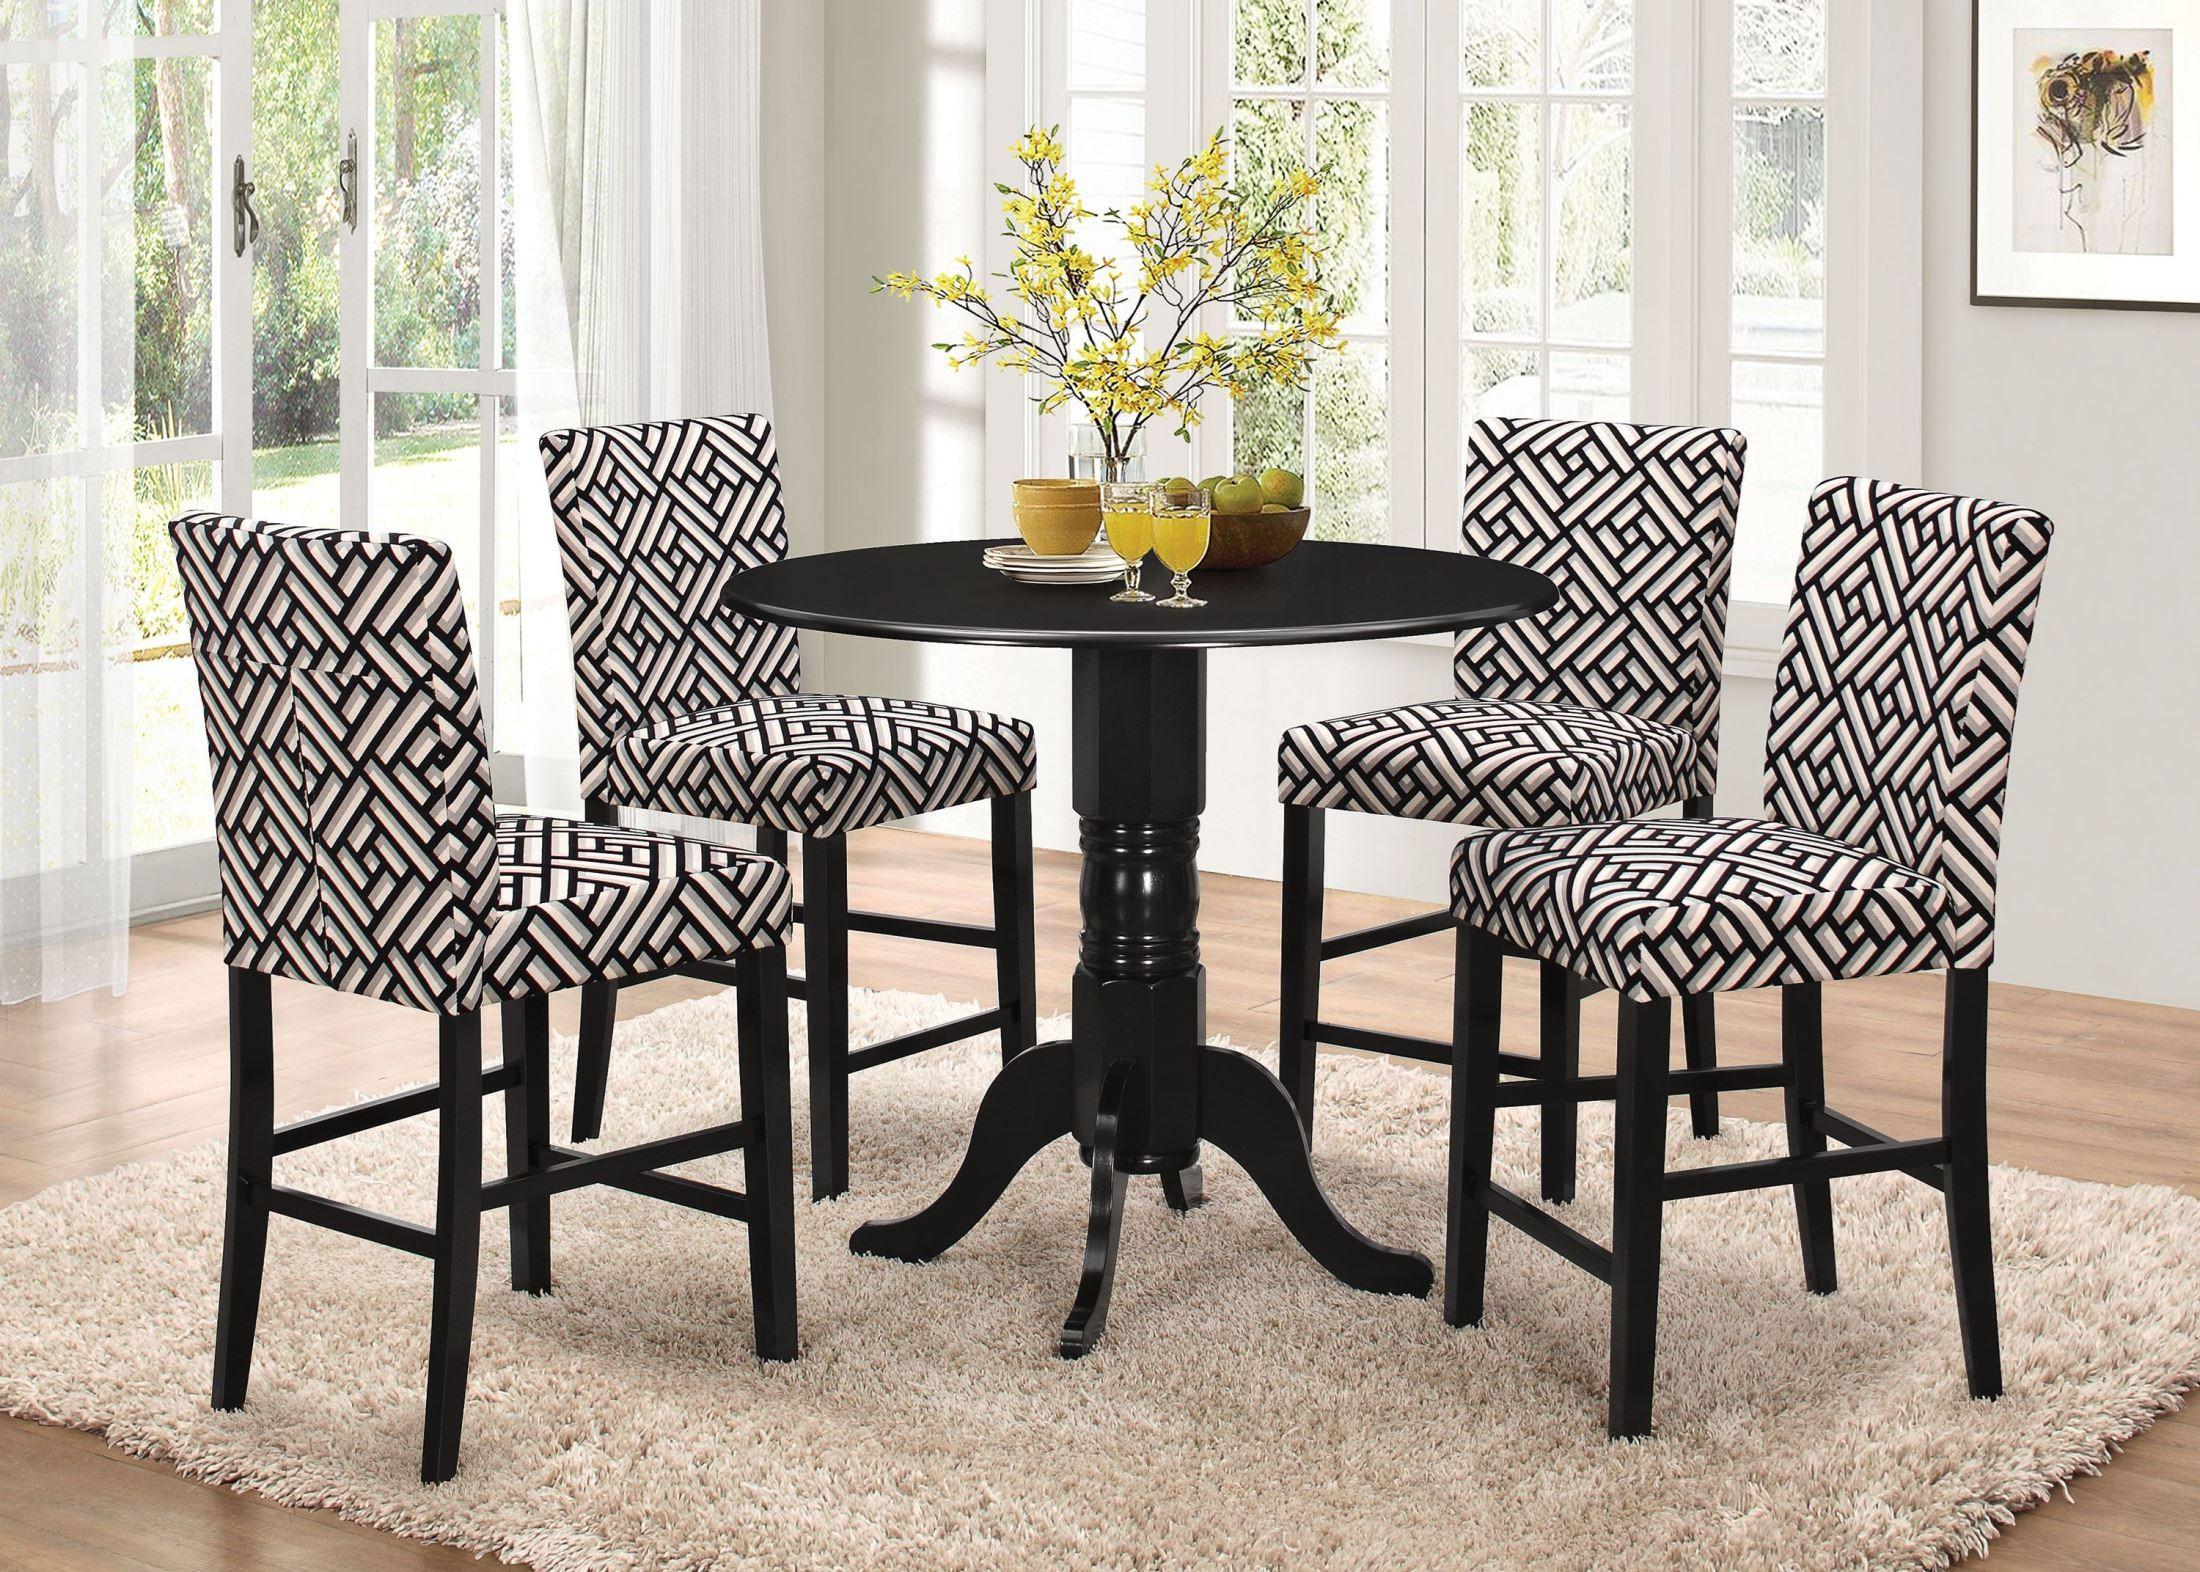 dorsett black counter height dining room set from coaster coleman furniture. Black Bedroom Furniture Sets. Home Design Ideas